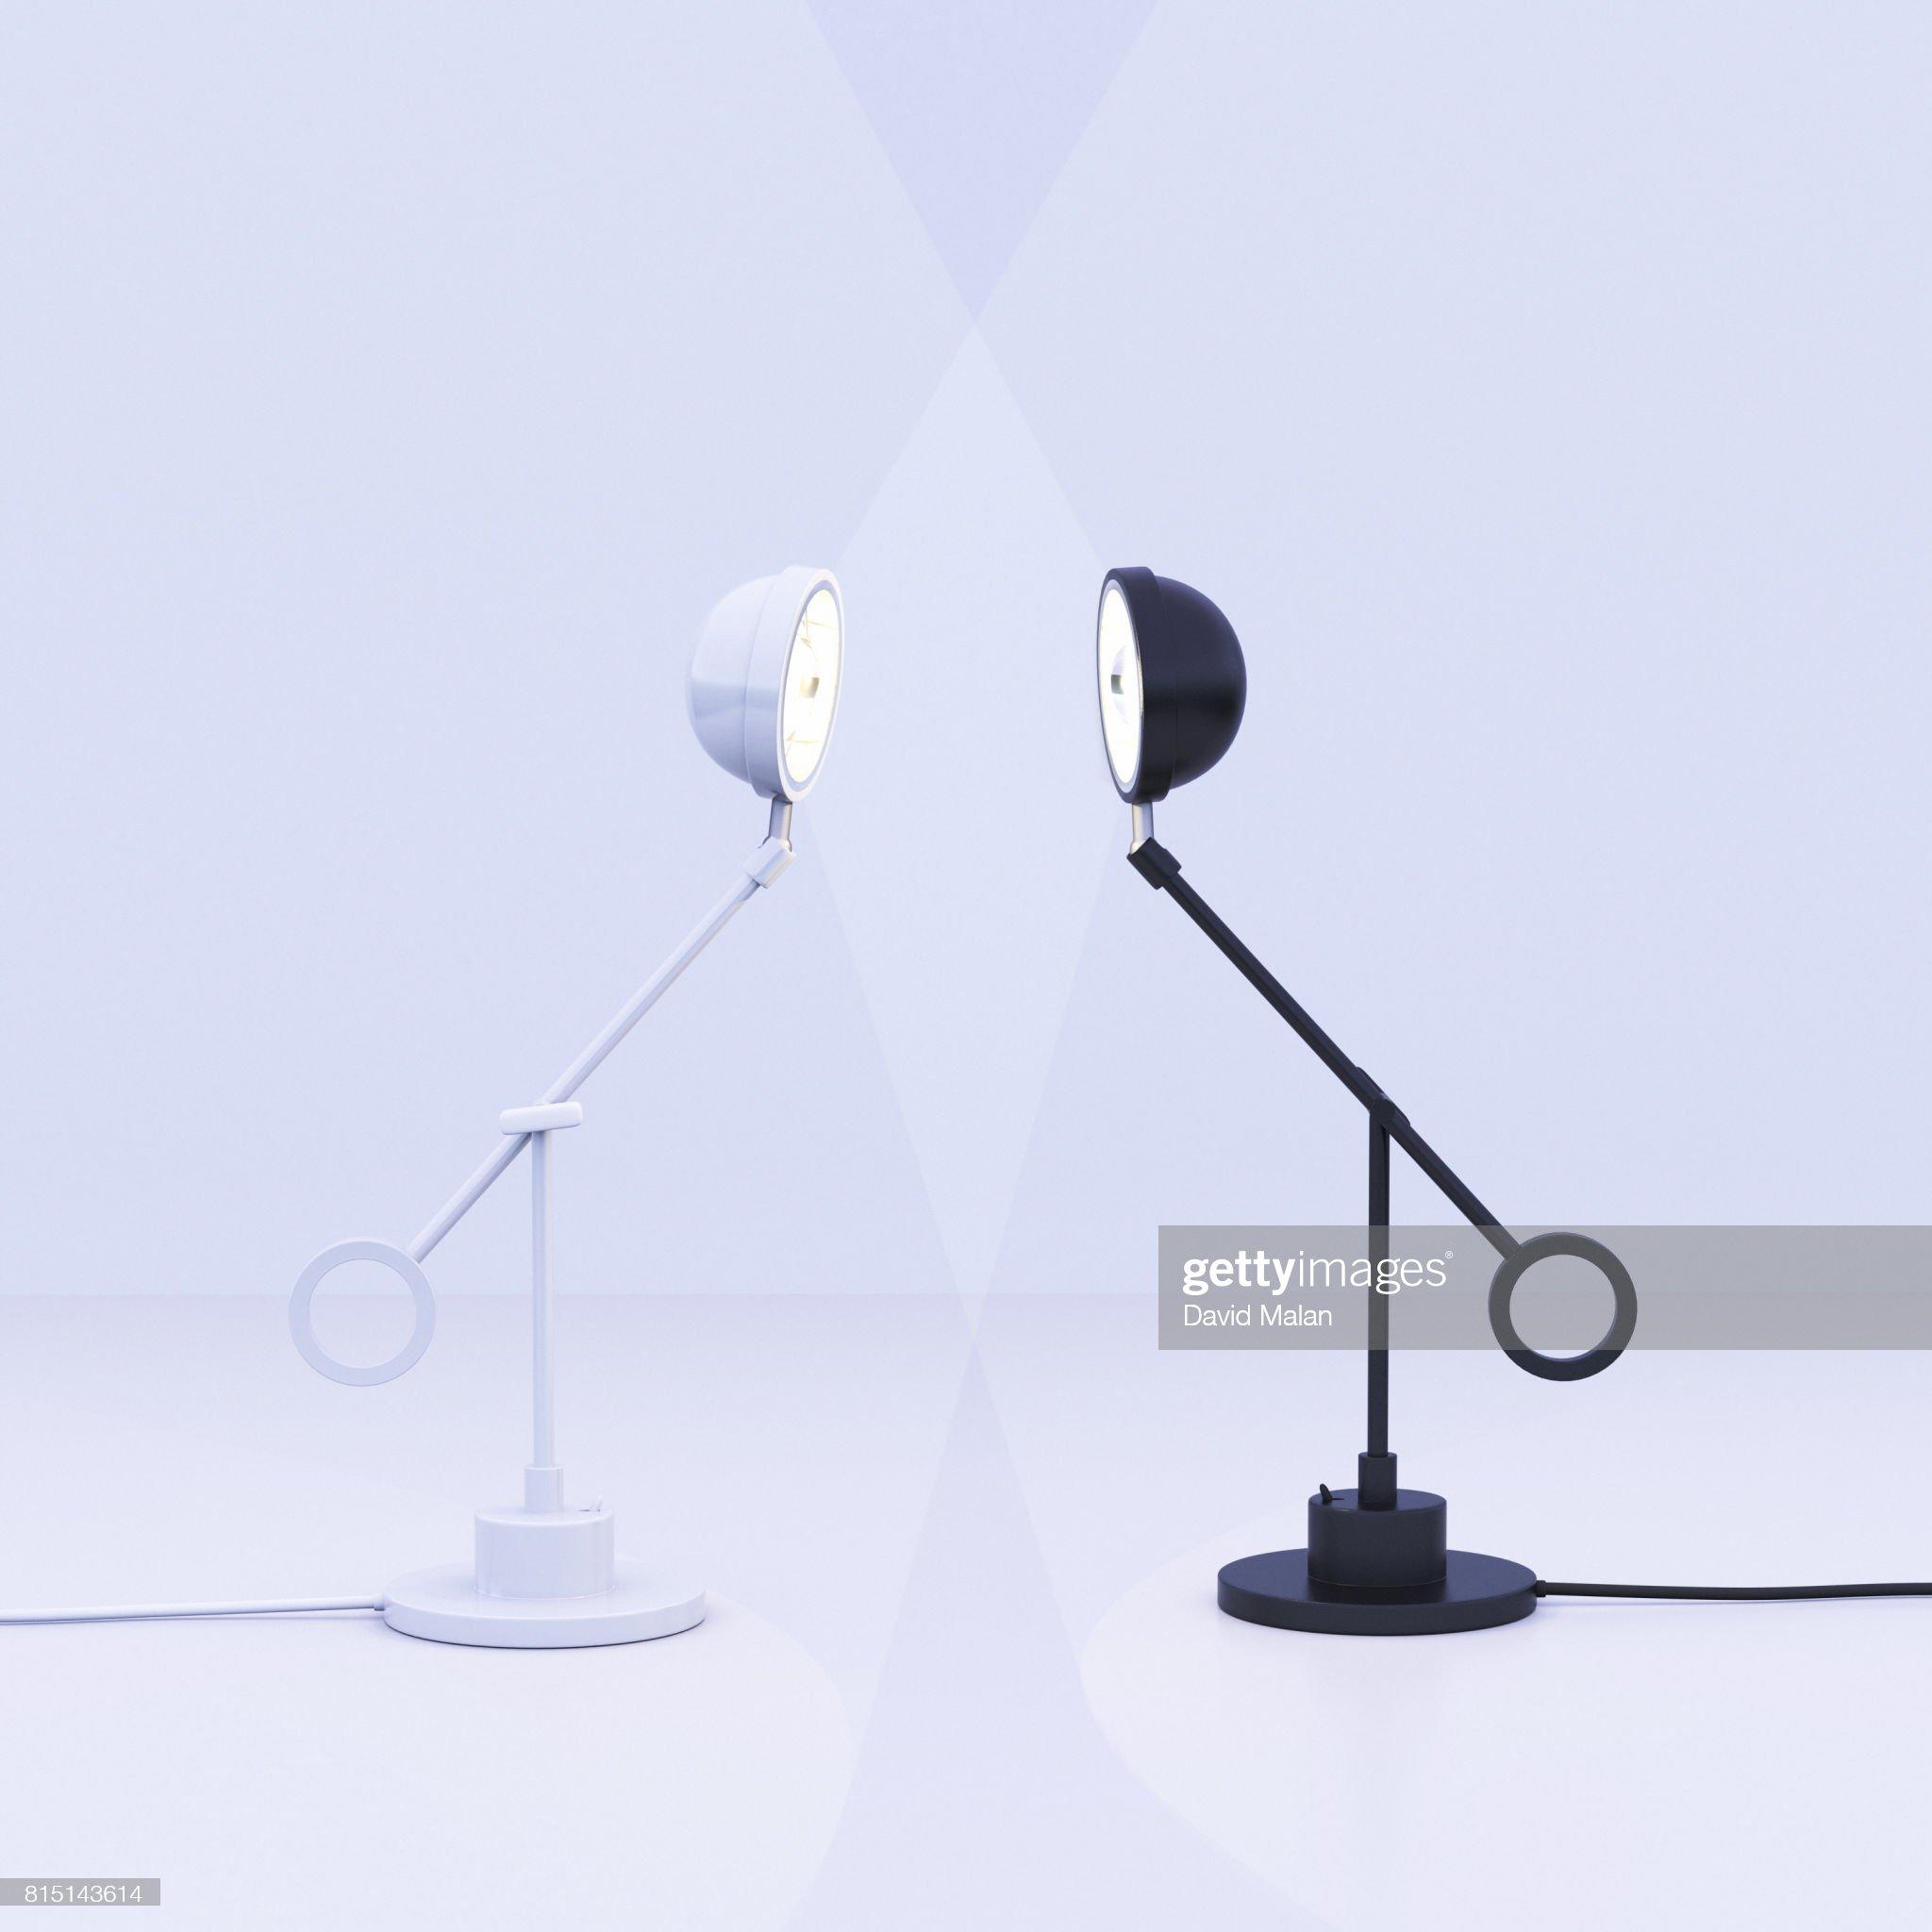 White lamp facing a black lamp. : 圖庫照片